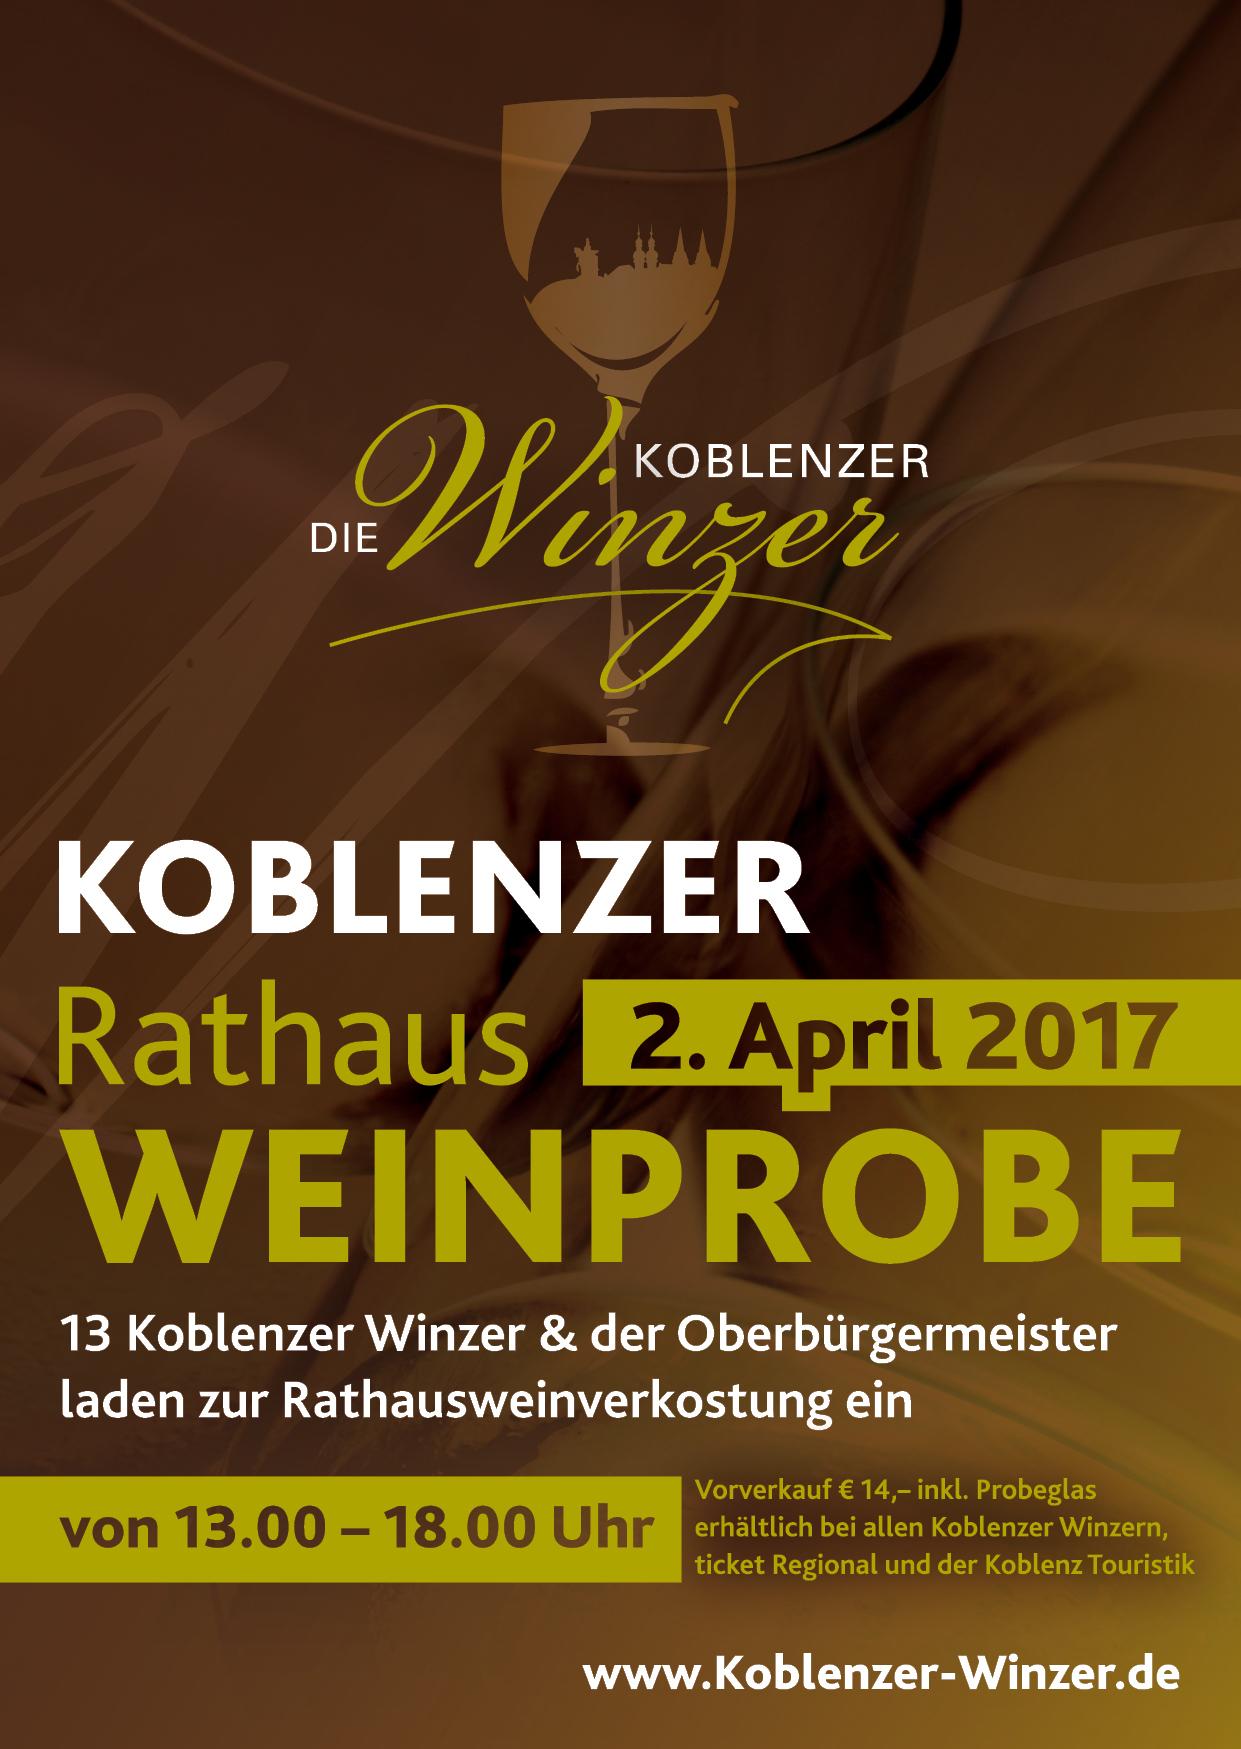 2017_02_06_KOWinzer_Rasthausweinprobe_DINA6_print